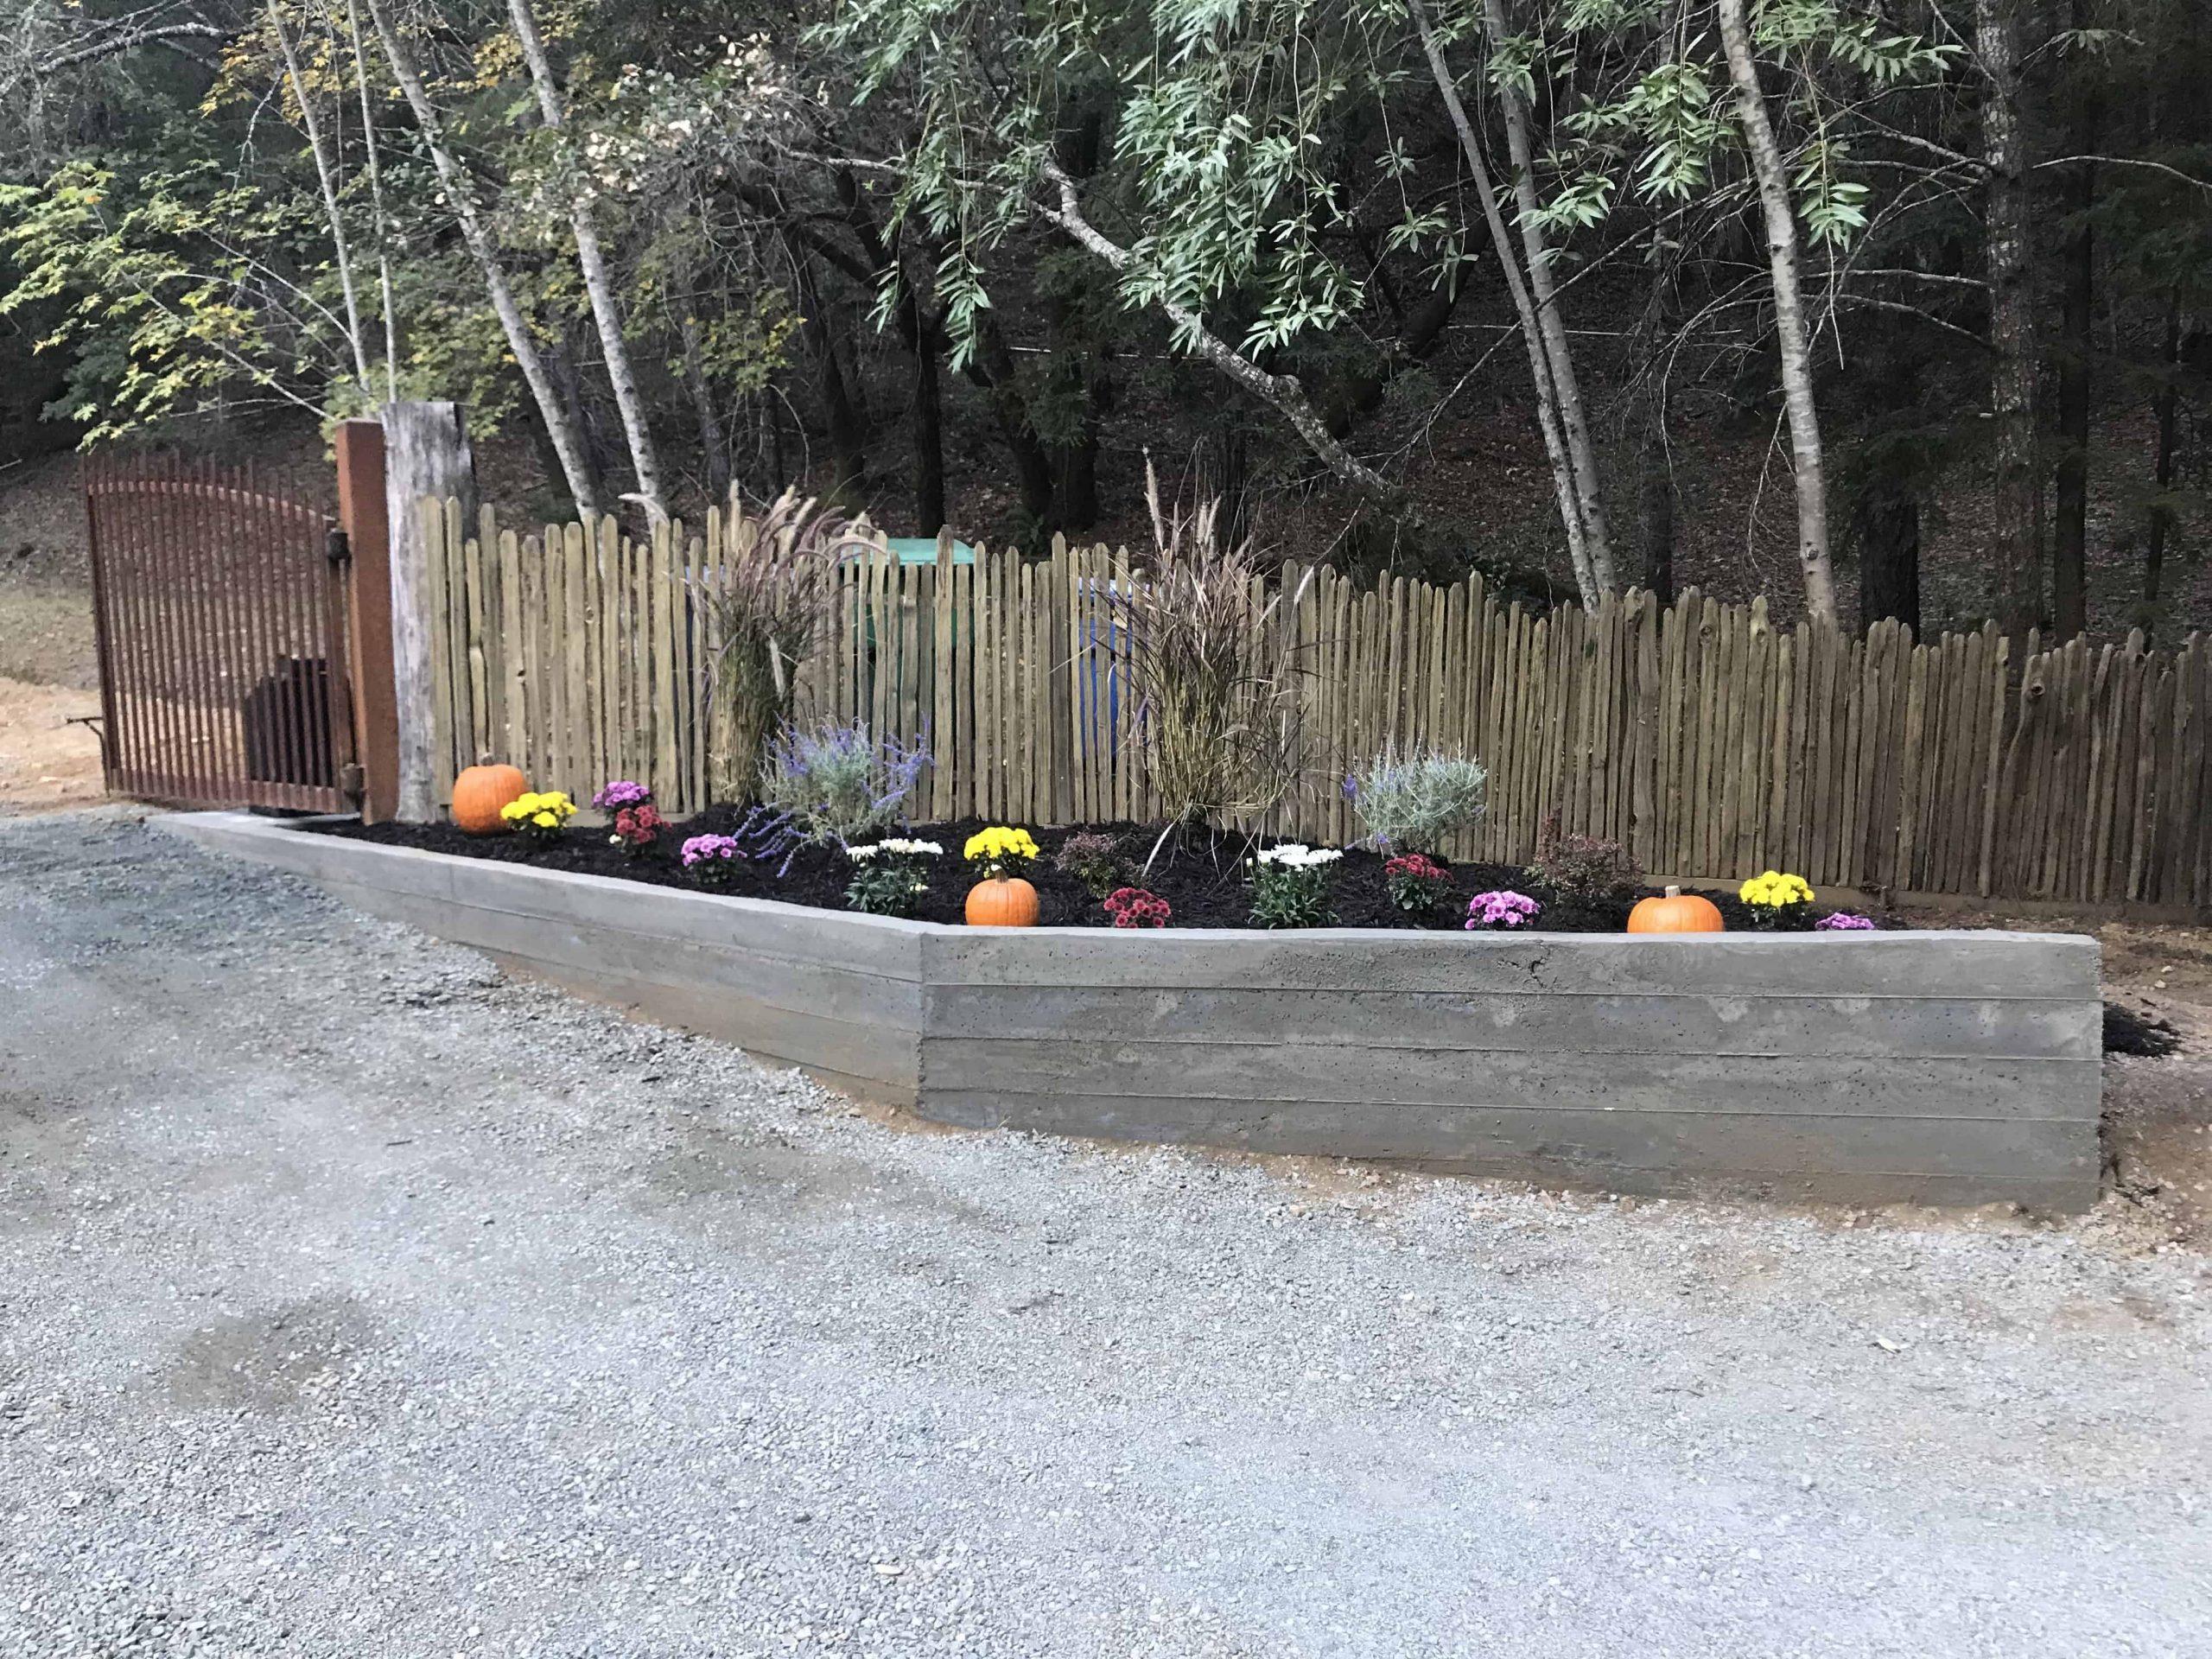 Landscaping companies in Santa Rosa